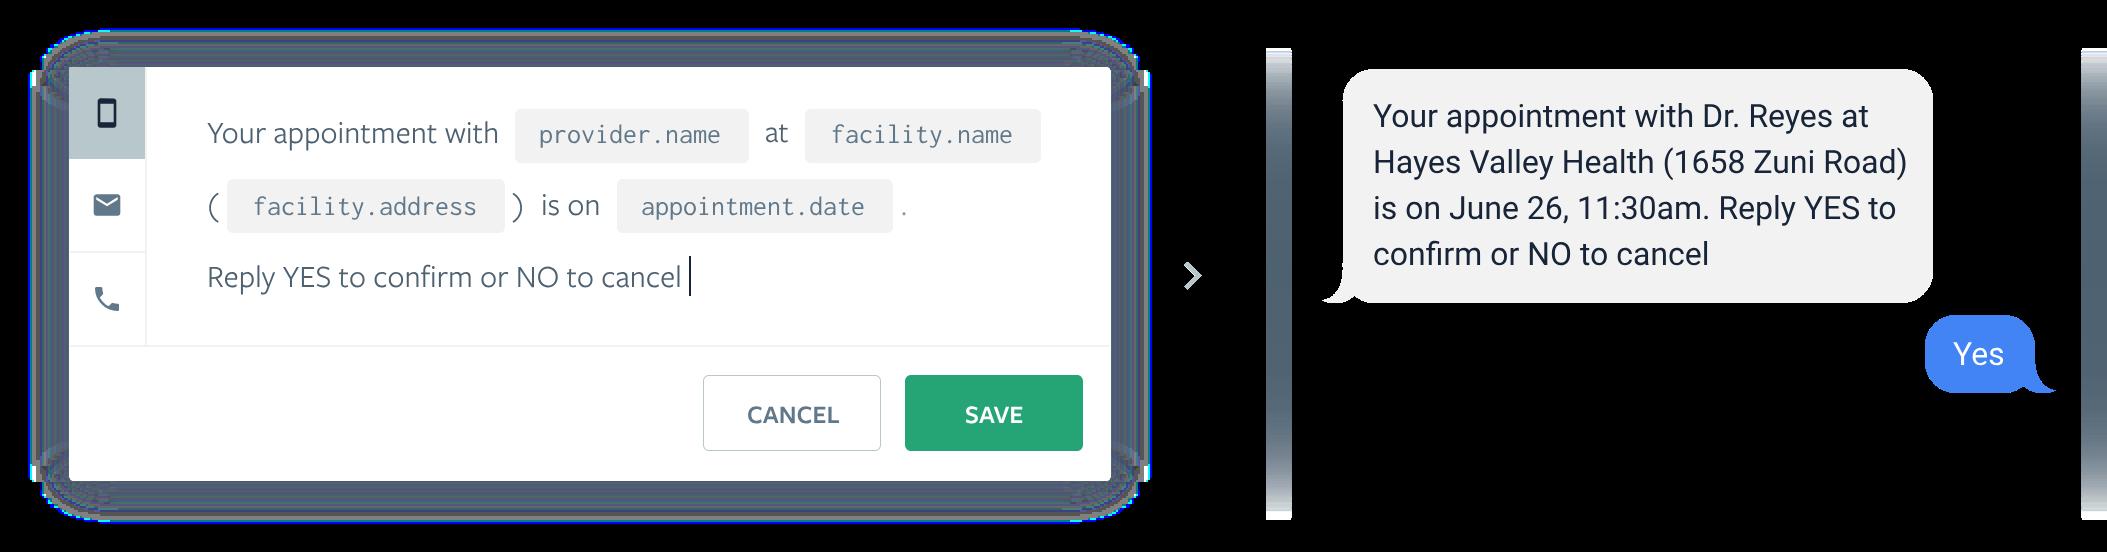 Luma Health - Intelligent Scheduling - Mobile Patient Communication